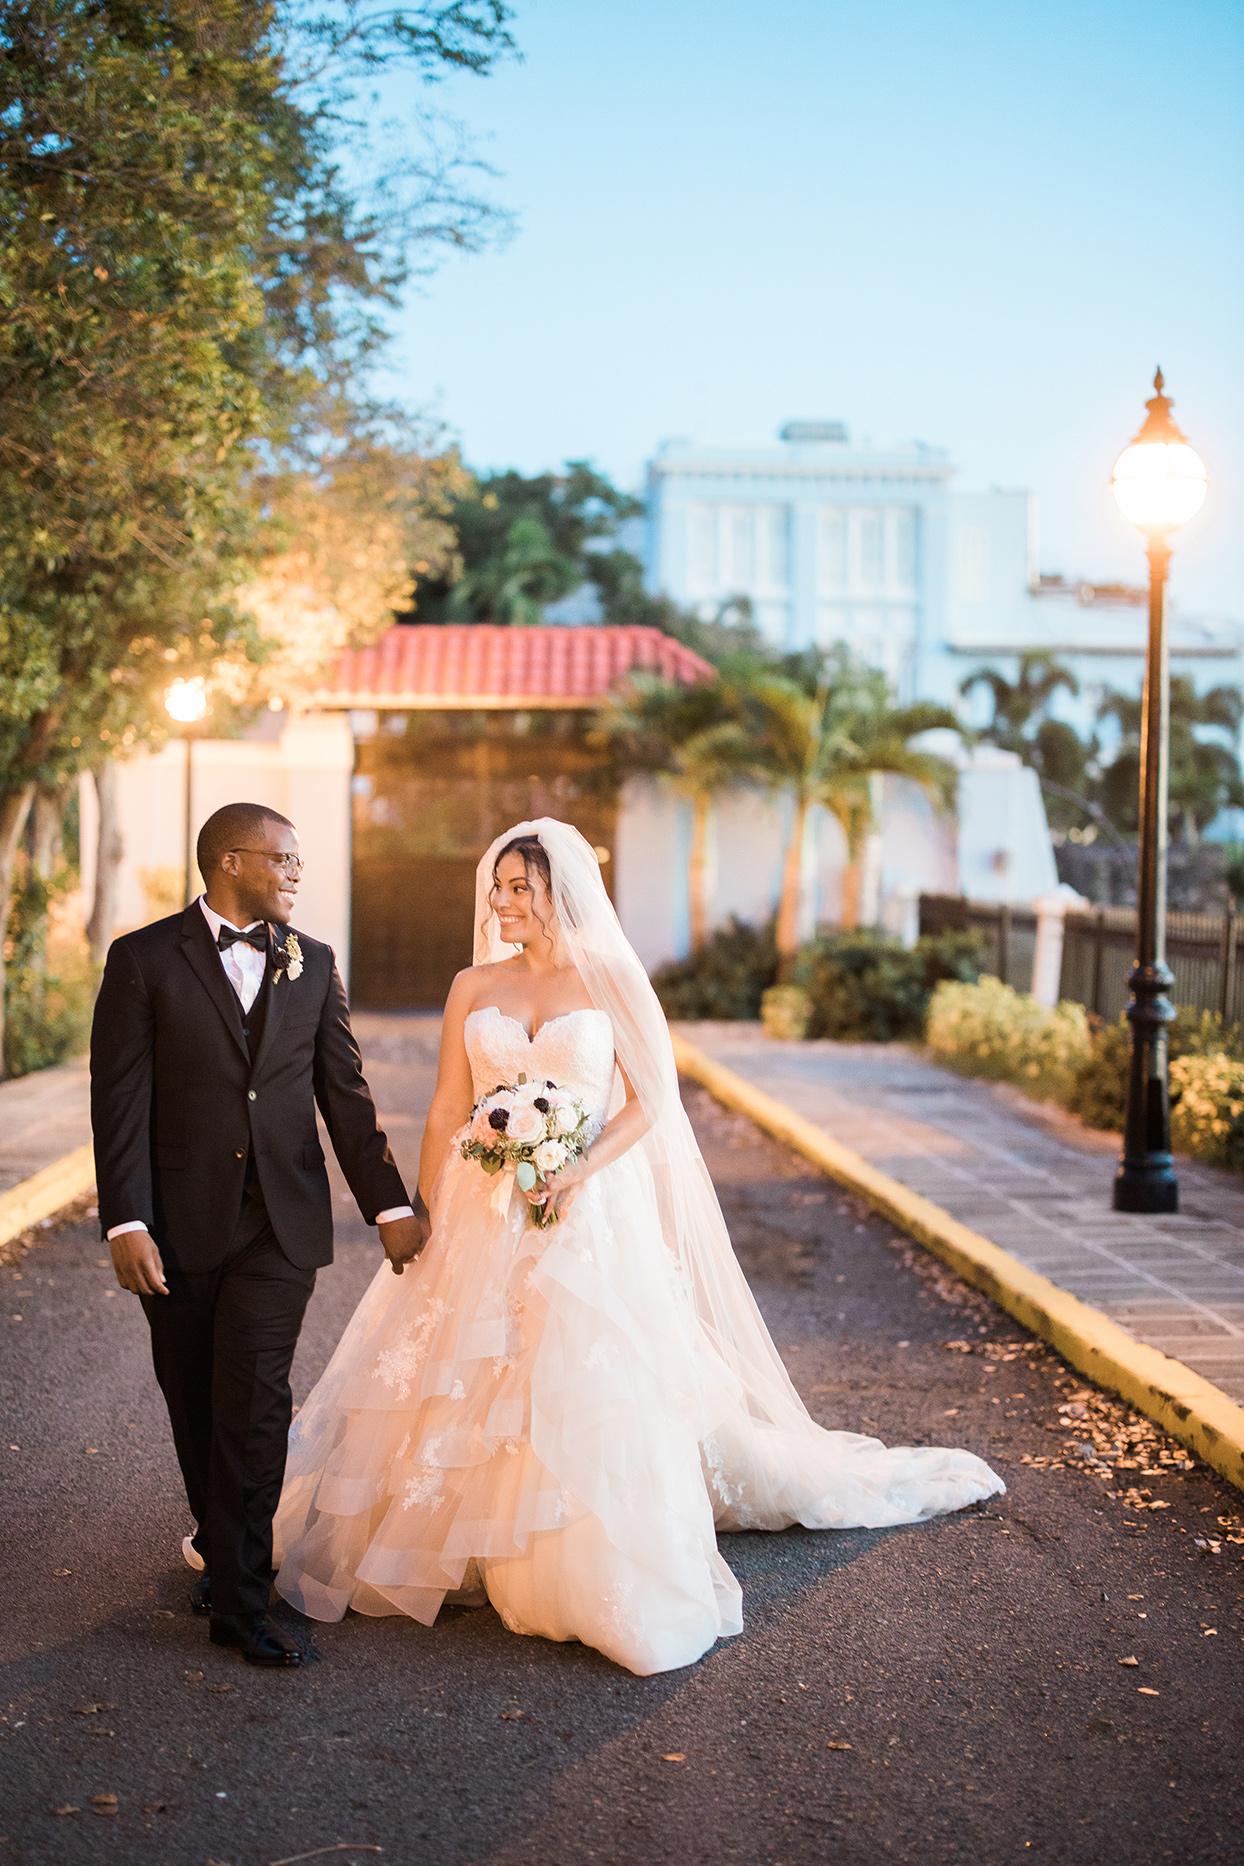 victoria tk wedding portraits by street lamp